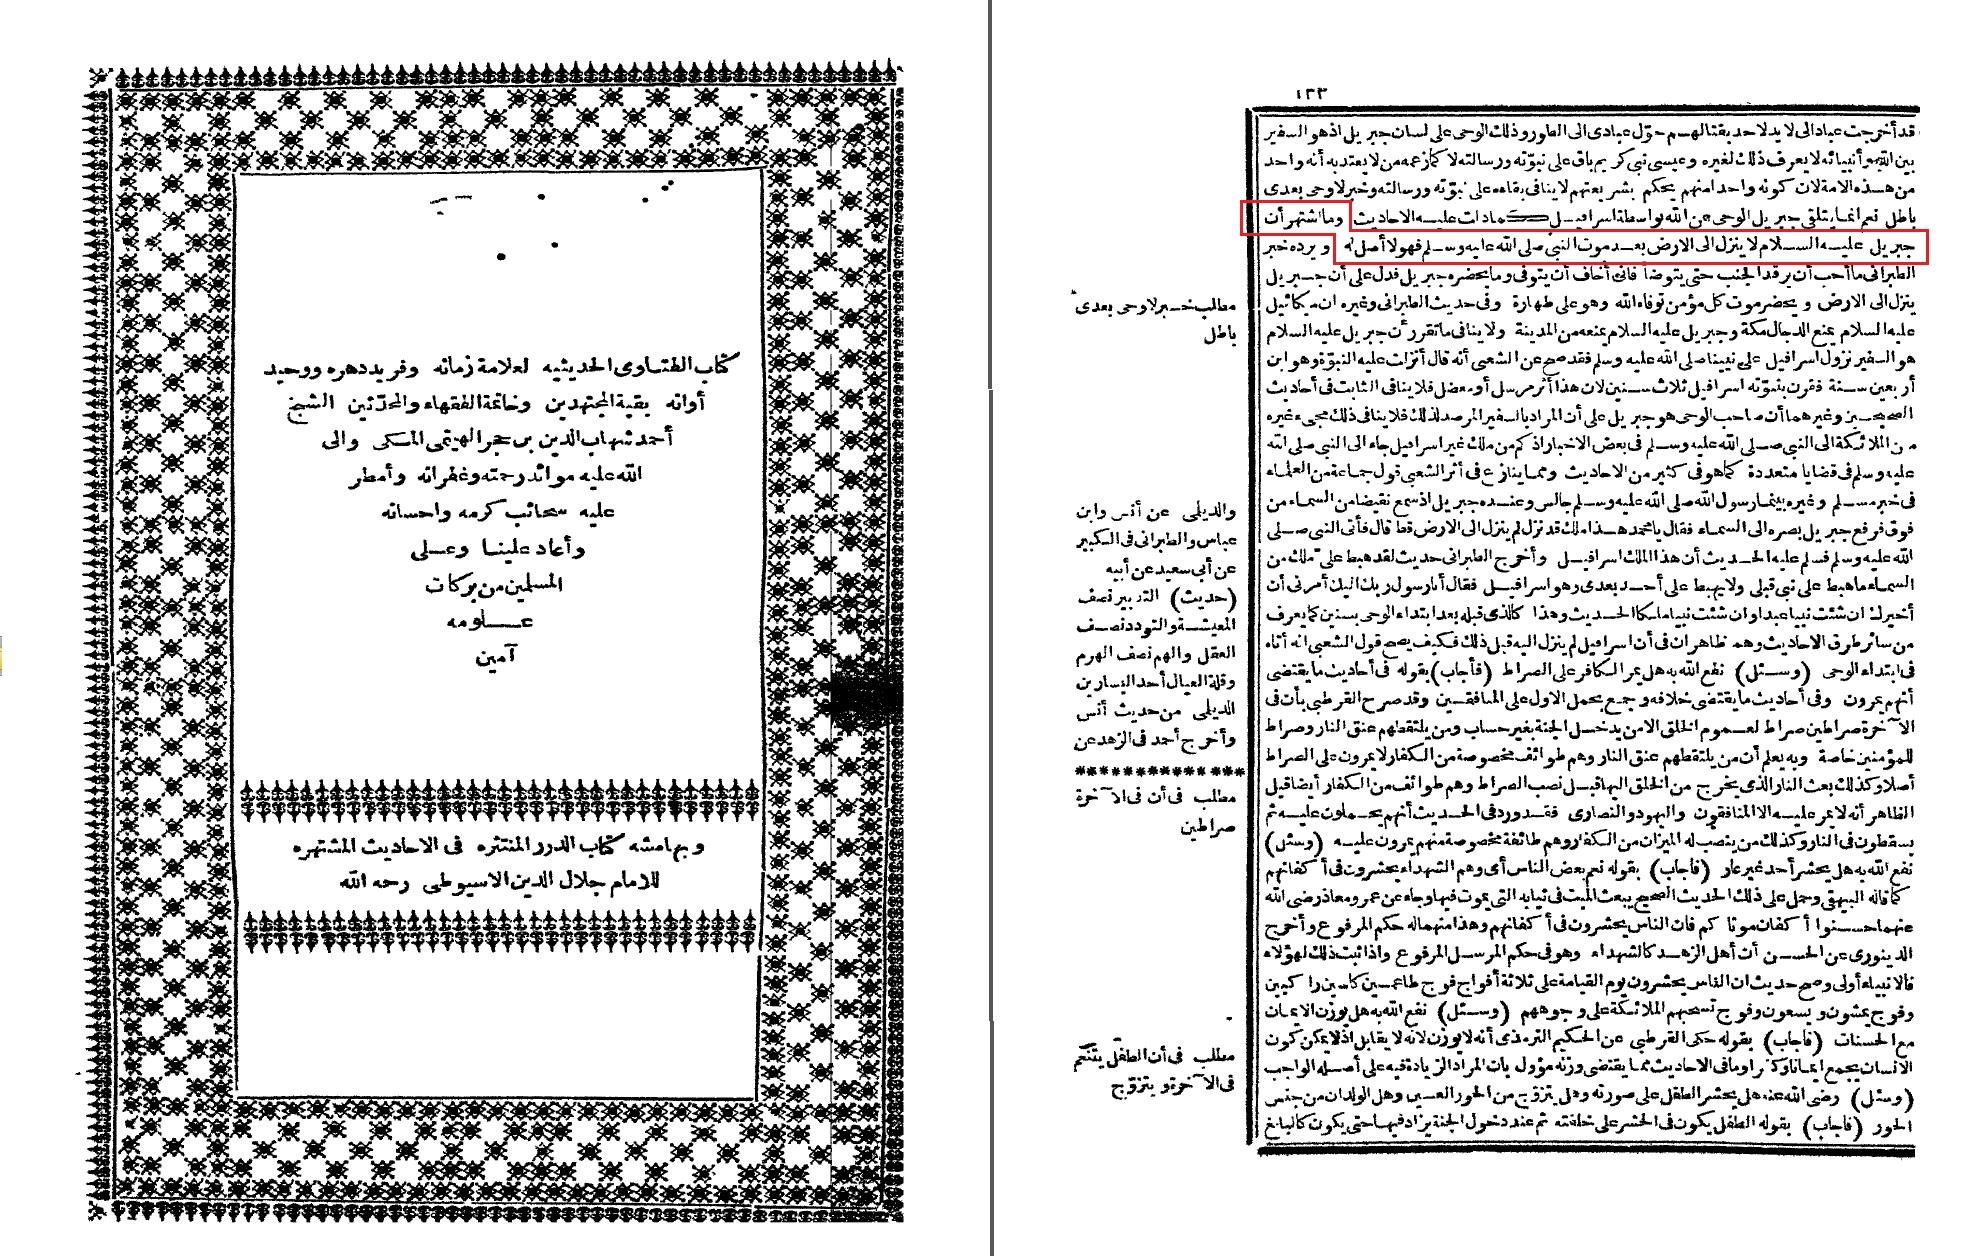 Fatawa-ye Hadithiyyah S 133